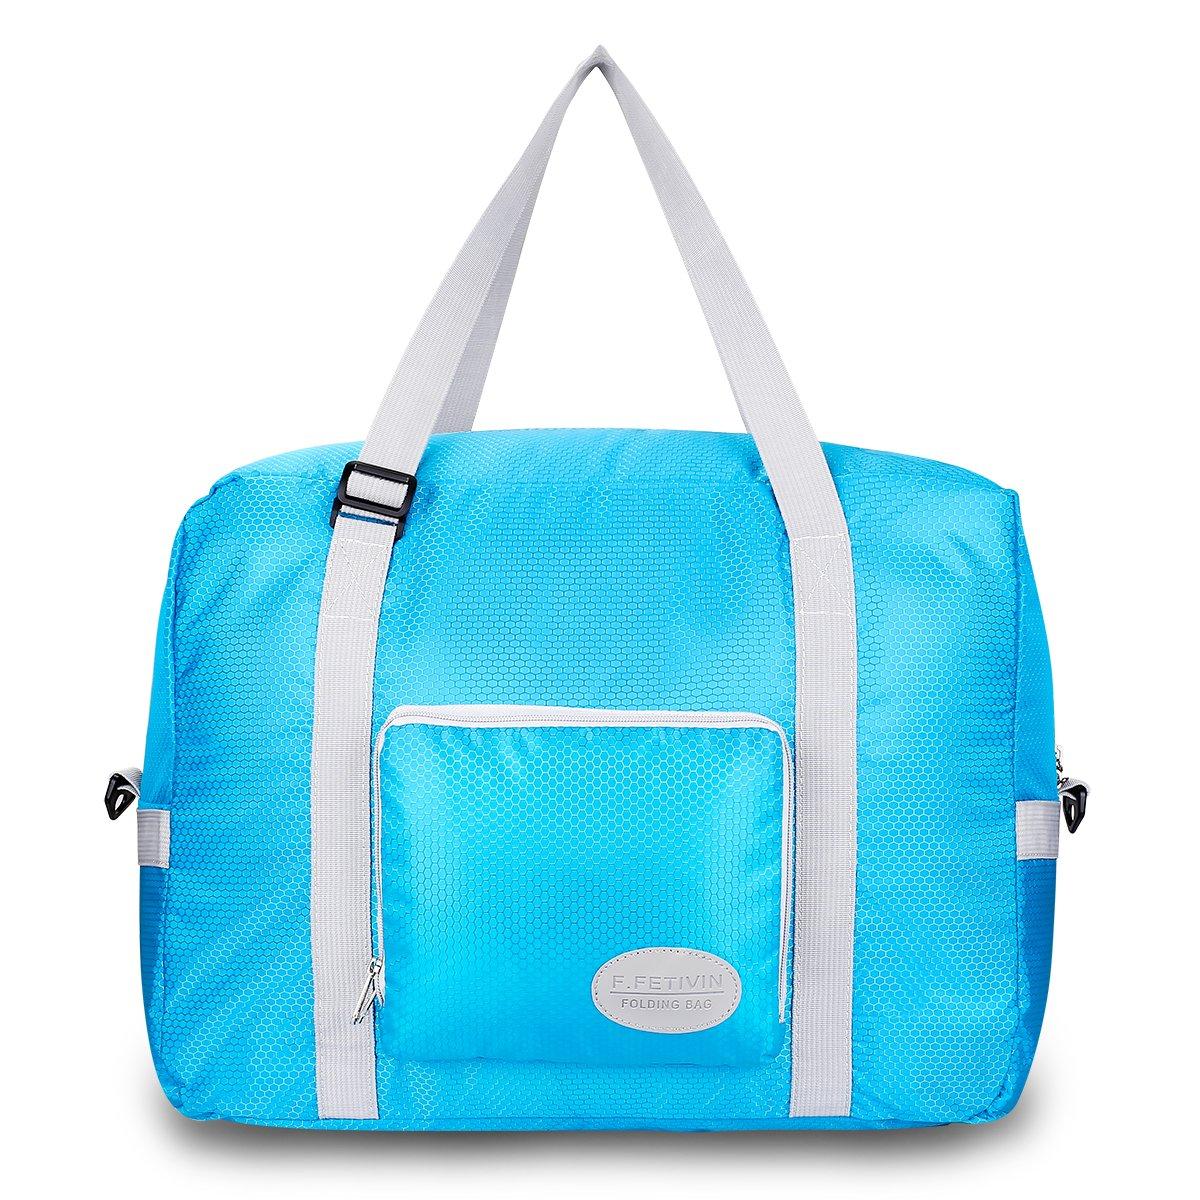 Lightweight Carry Storage Luggage Tote Duffel Bag. Travel Foldable Waterproof Duffel Bag